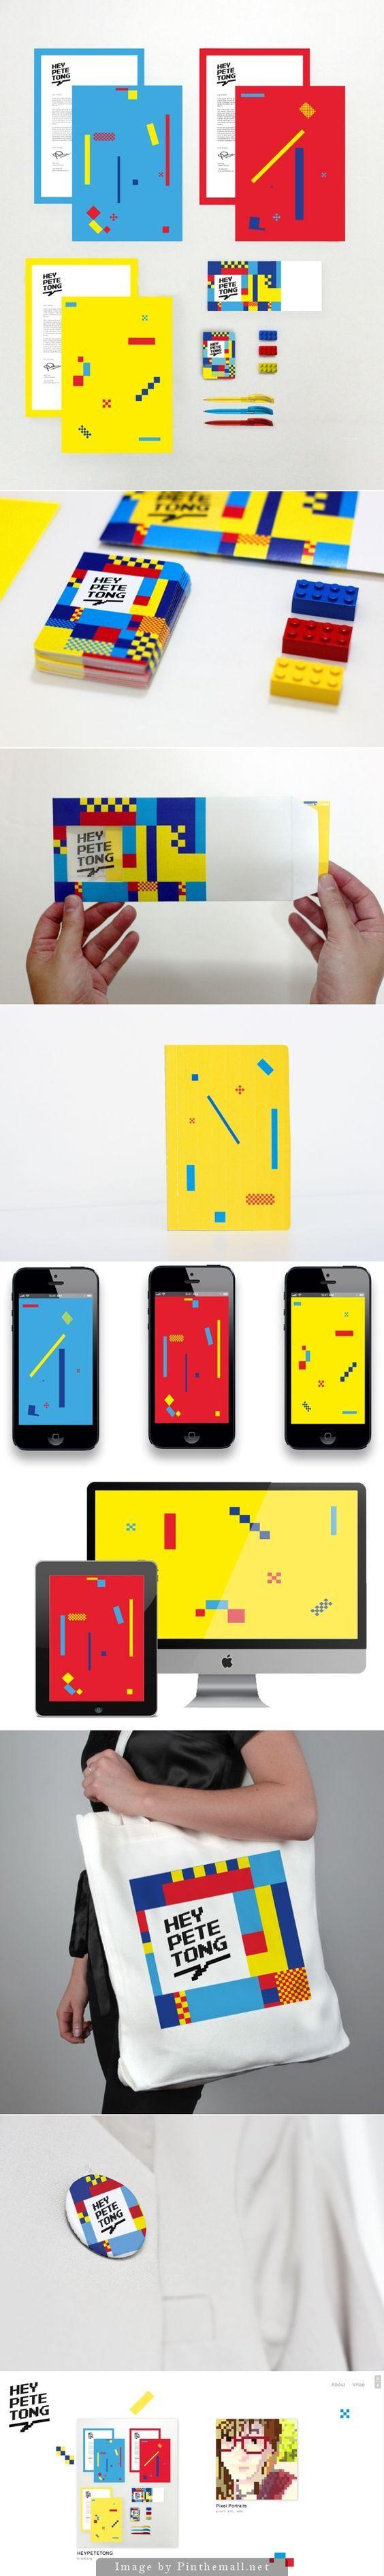 Hey Pete Tong Branding   Fivestar Branding – Design and Branding Agency & Inspiration Gallery